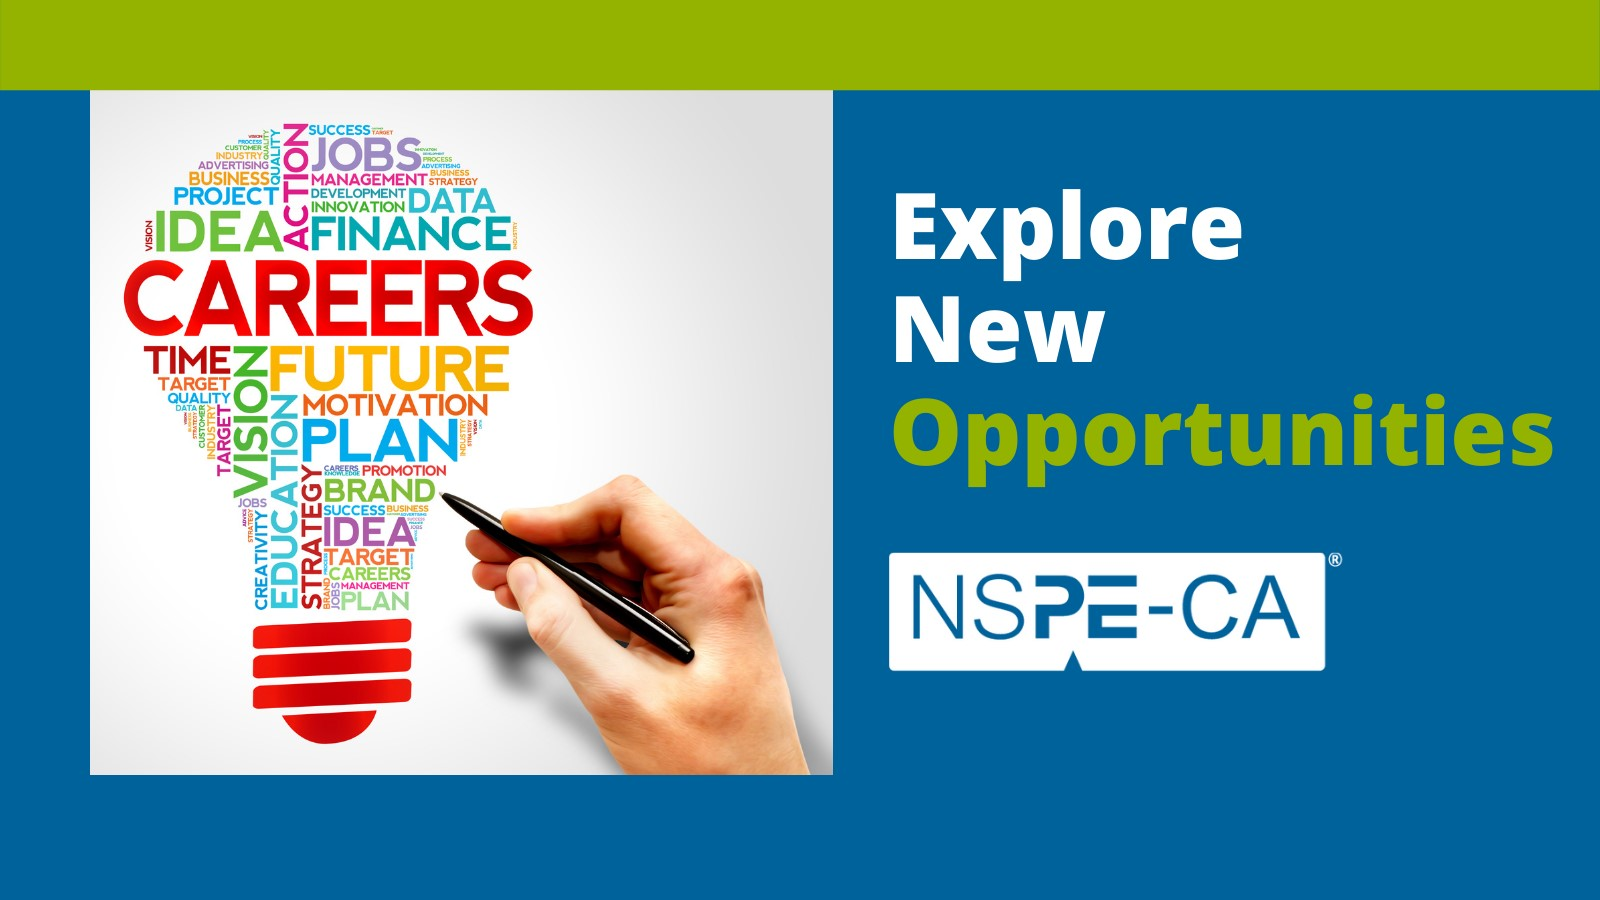 Explore New Opportunities